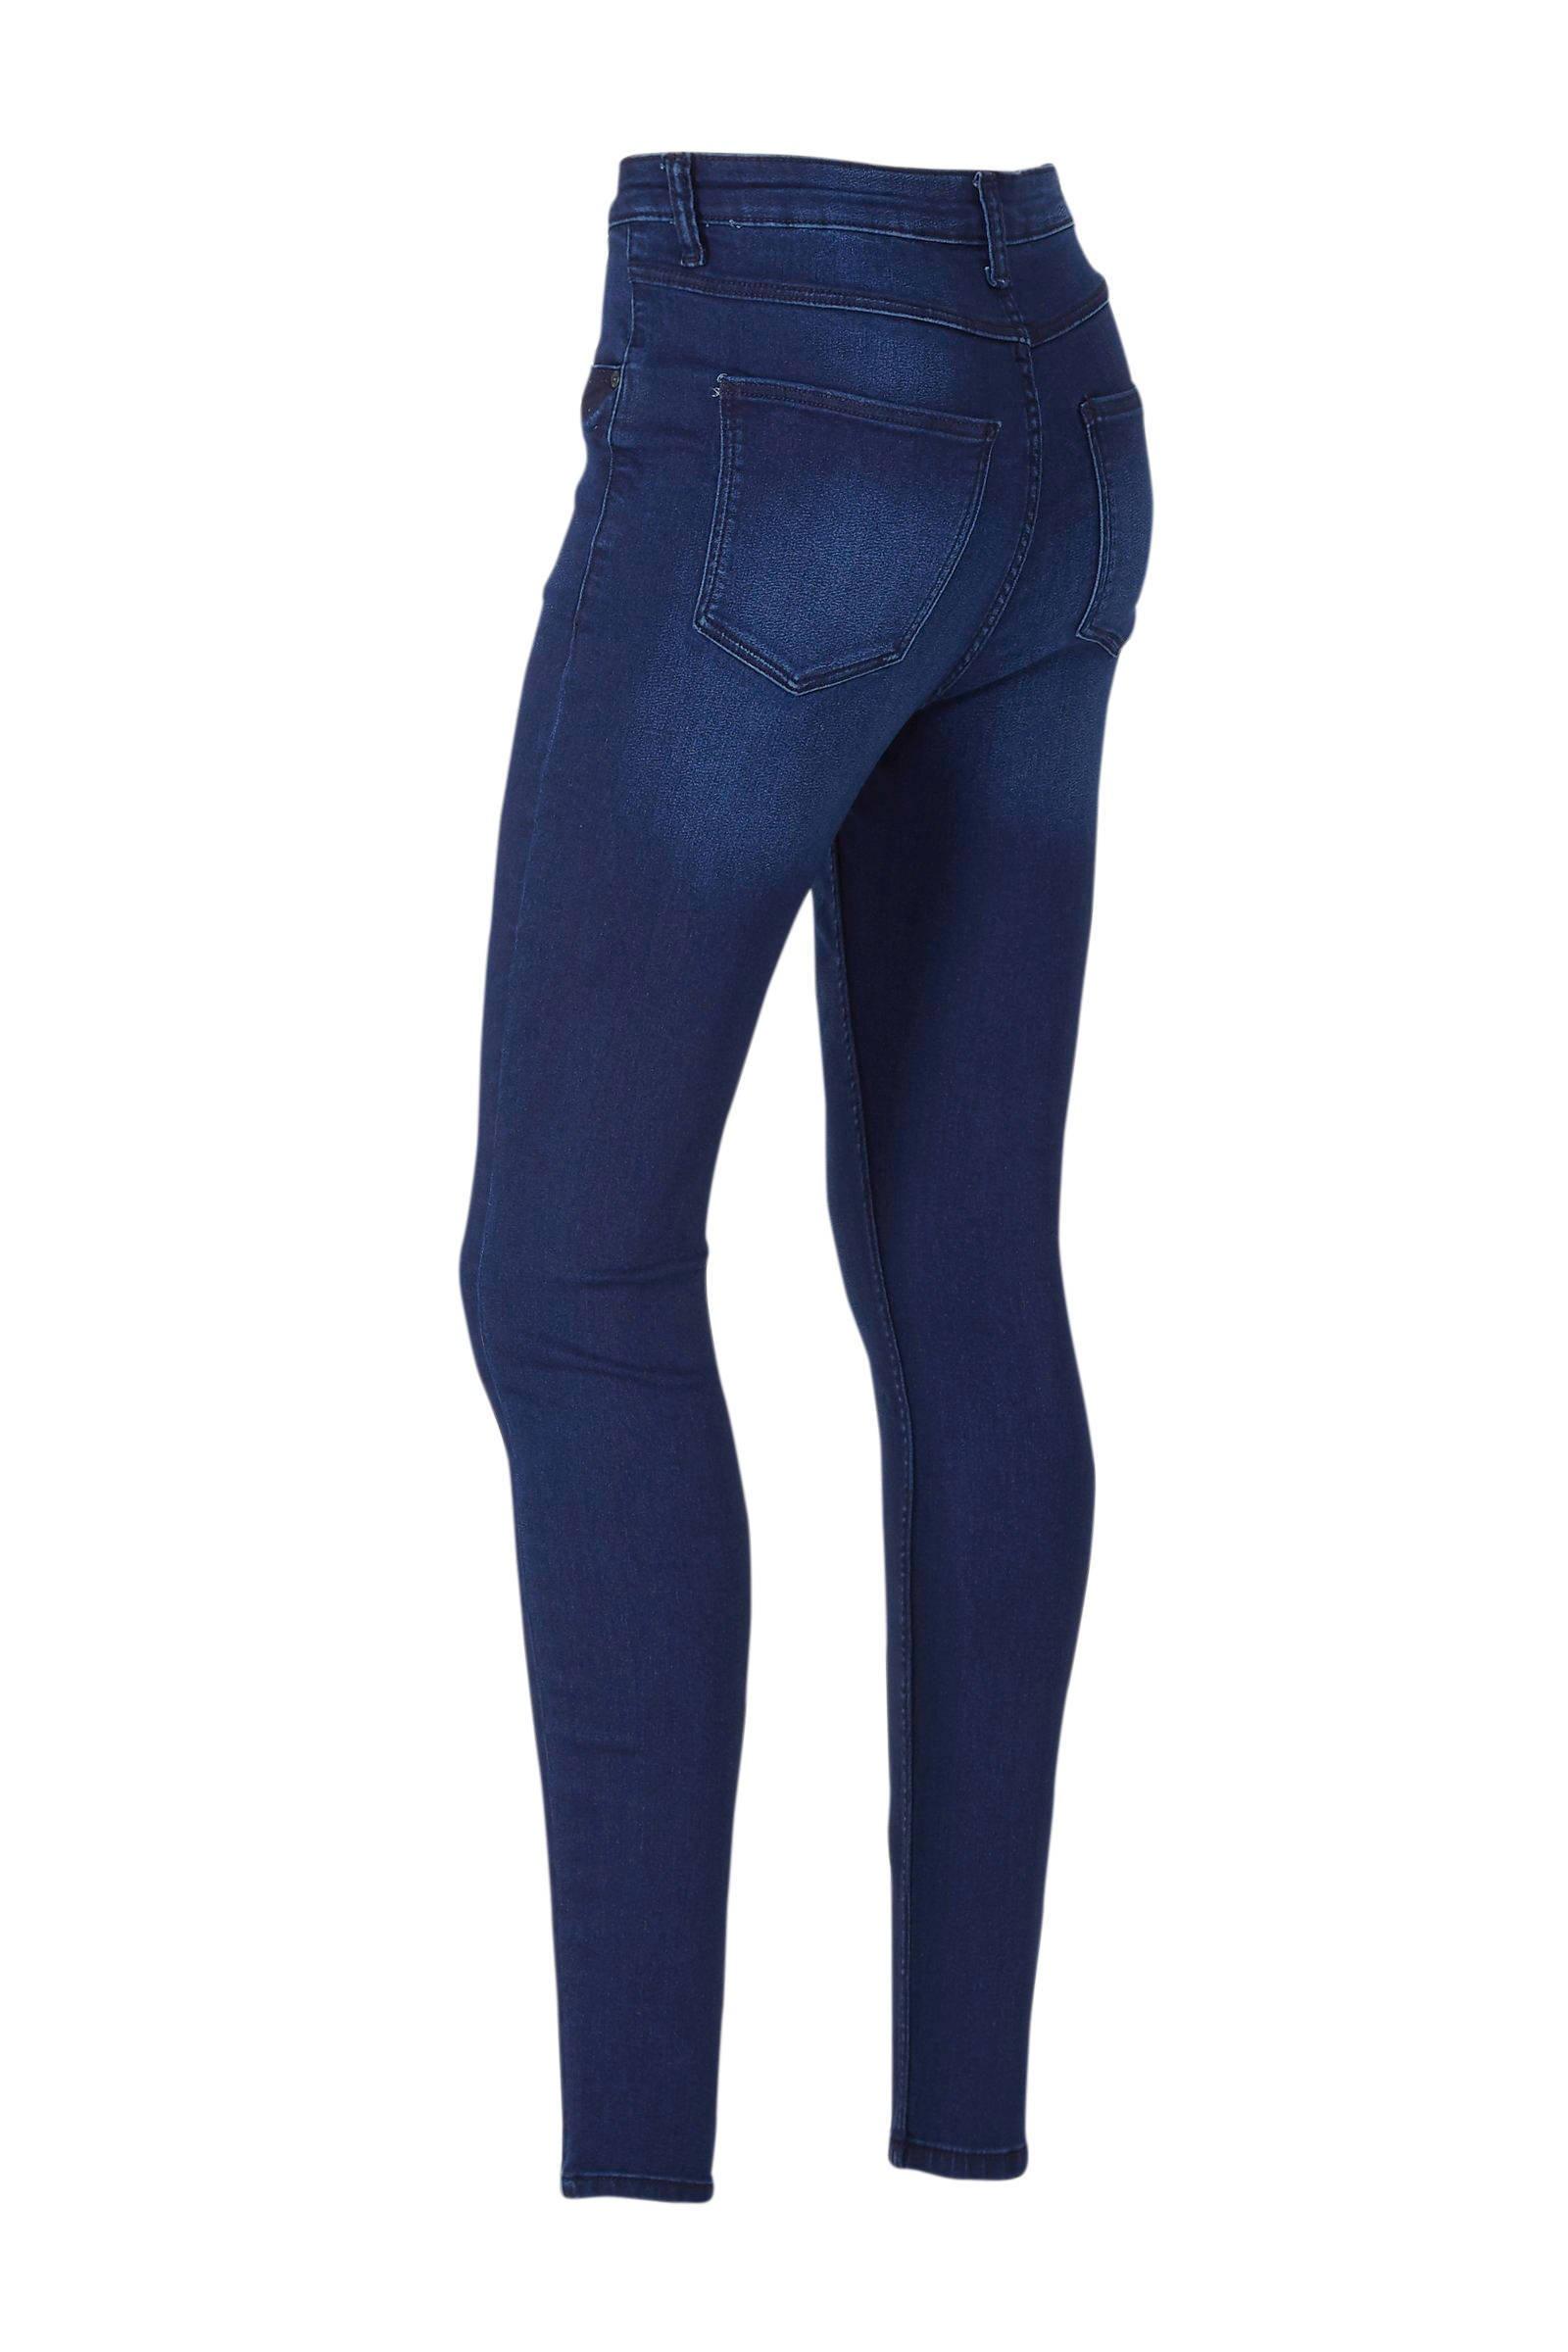 C&A The Denim high waist skinny jeans donkerblauw